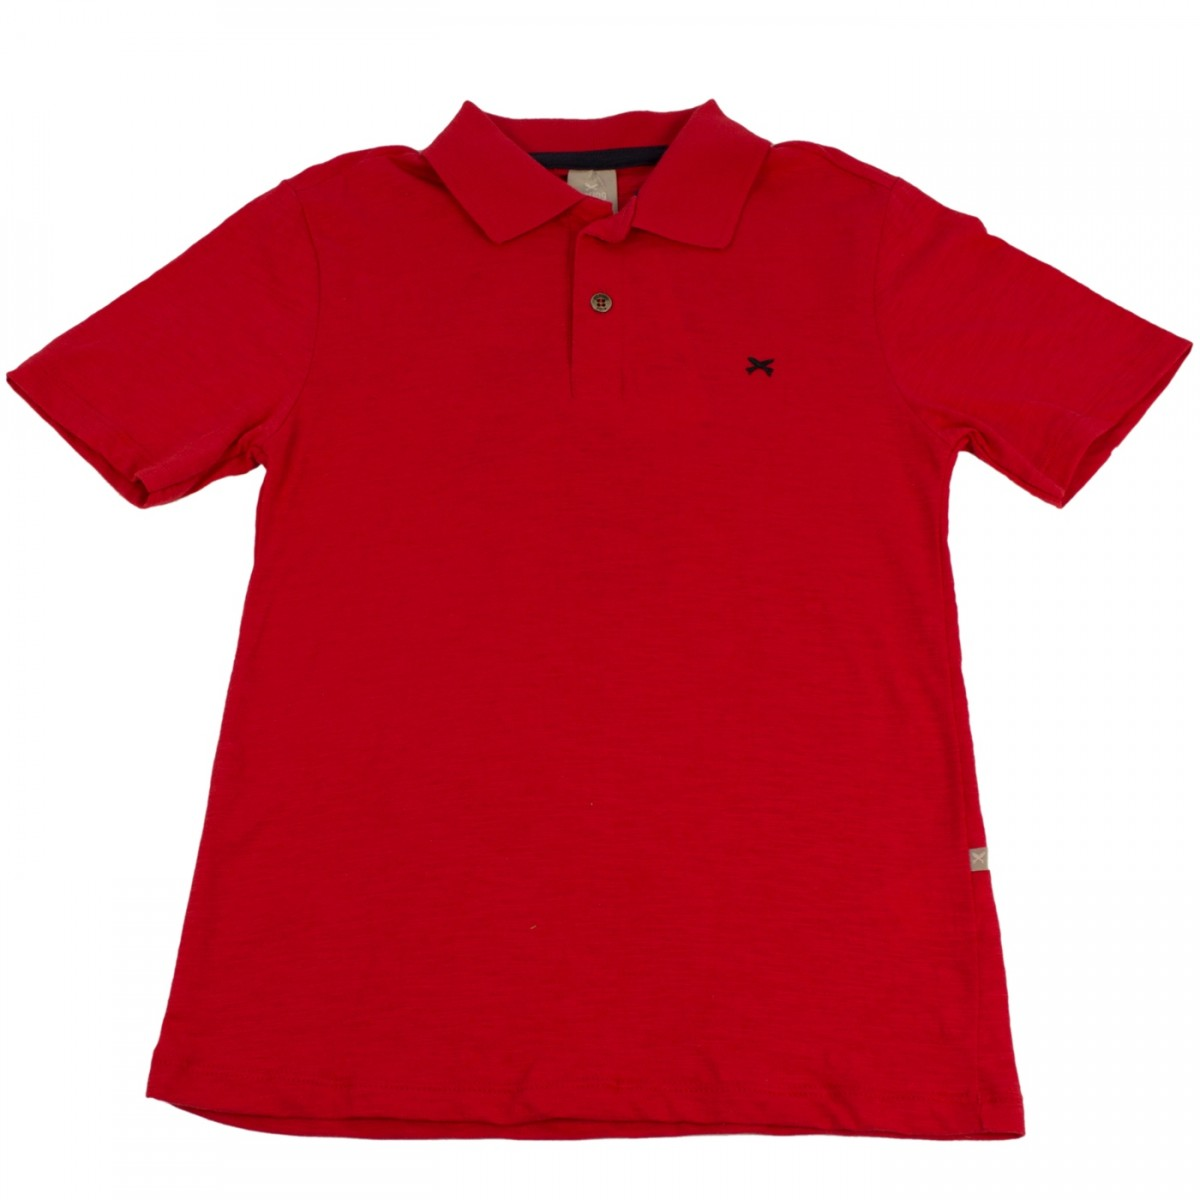 de7f371c289aa Bizz Store - Camisa Polo Infantil Menino Hering Kids Vermelha